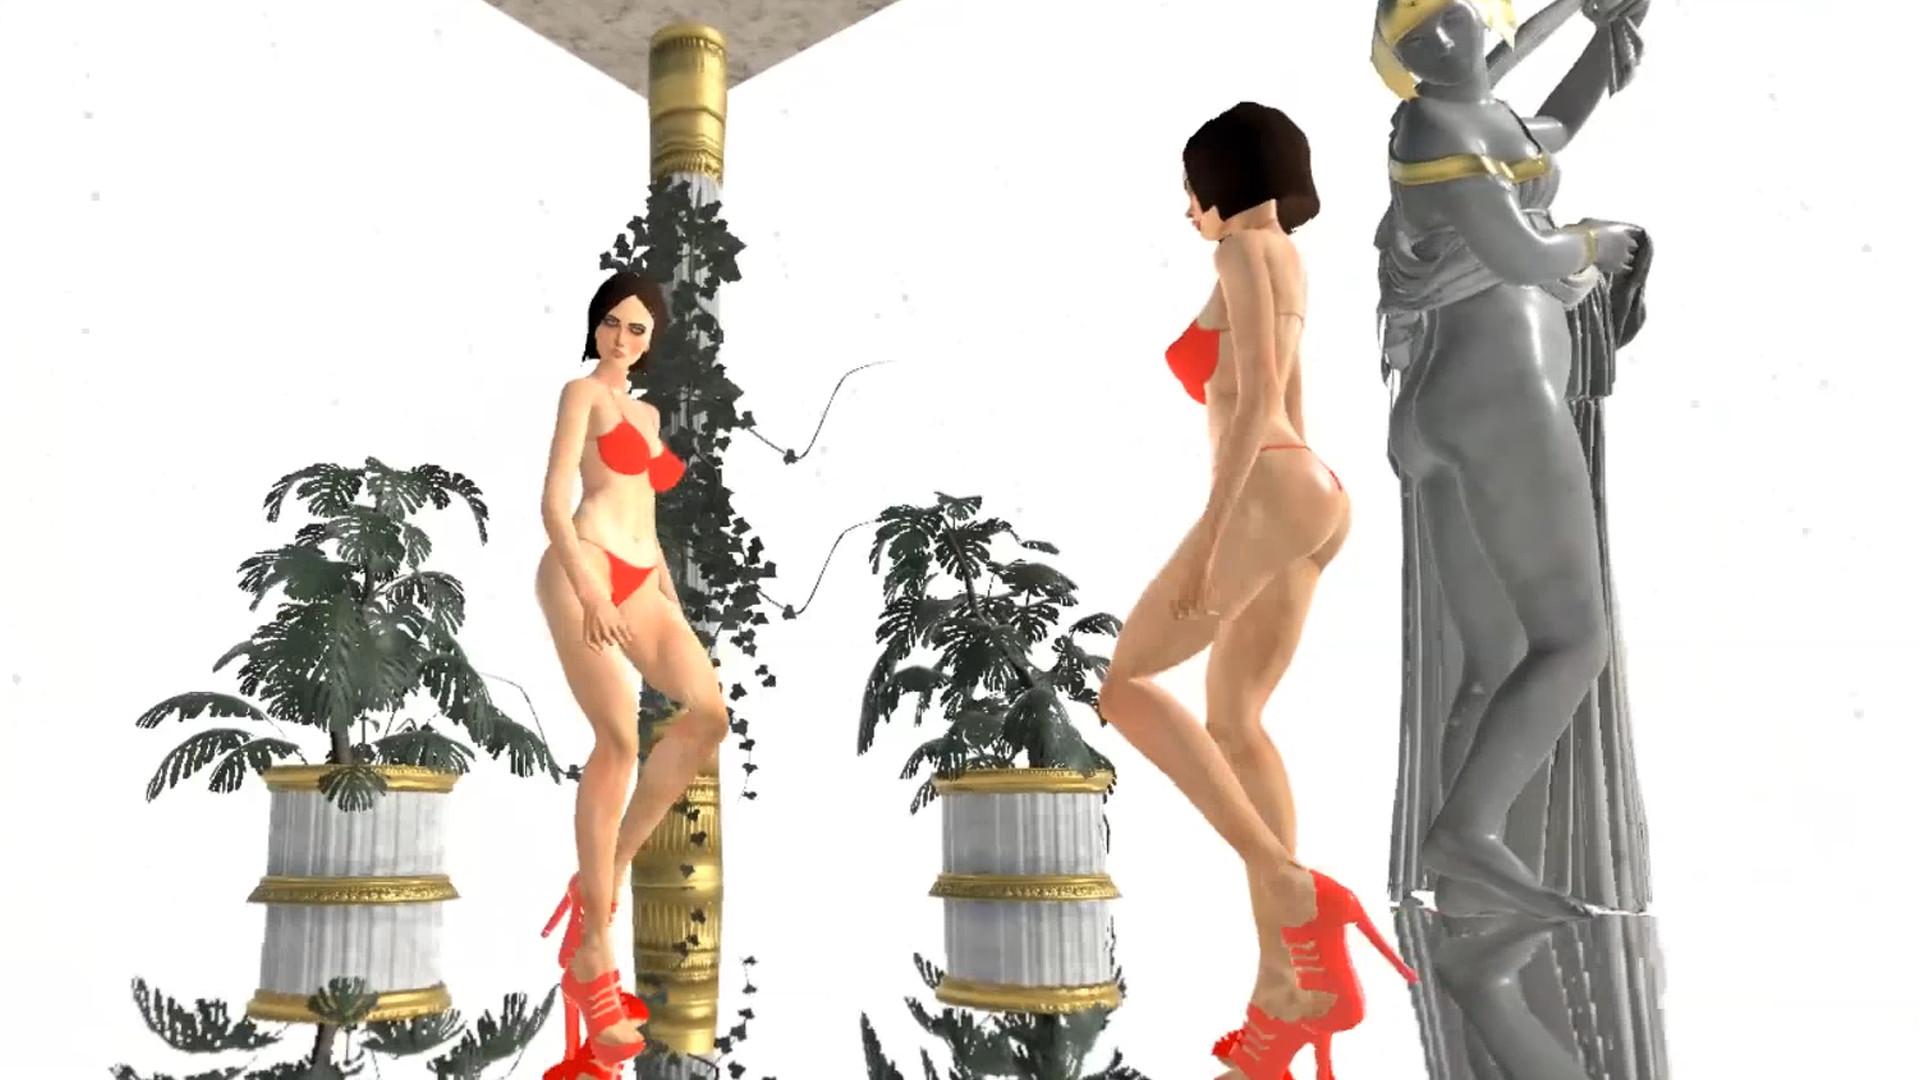 HOT GIRLS VR Free Download